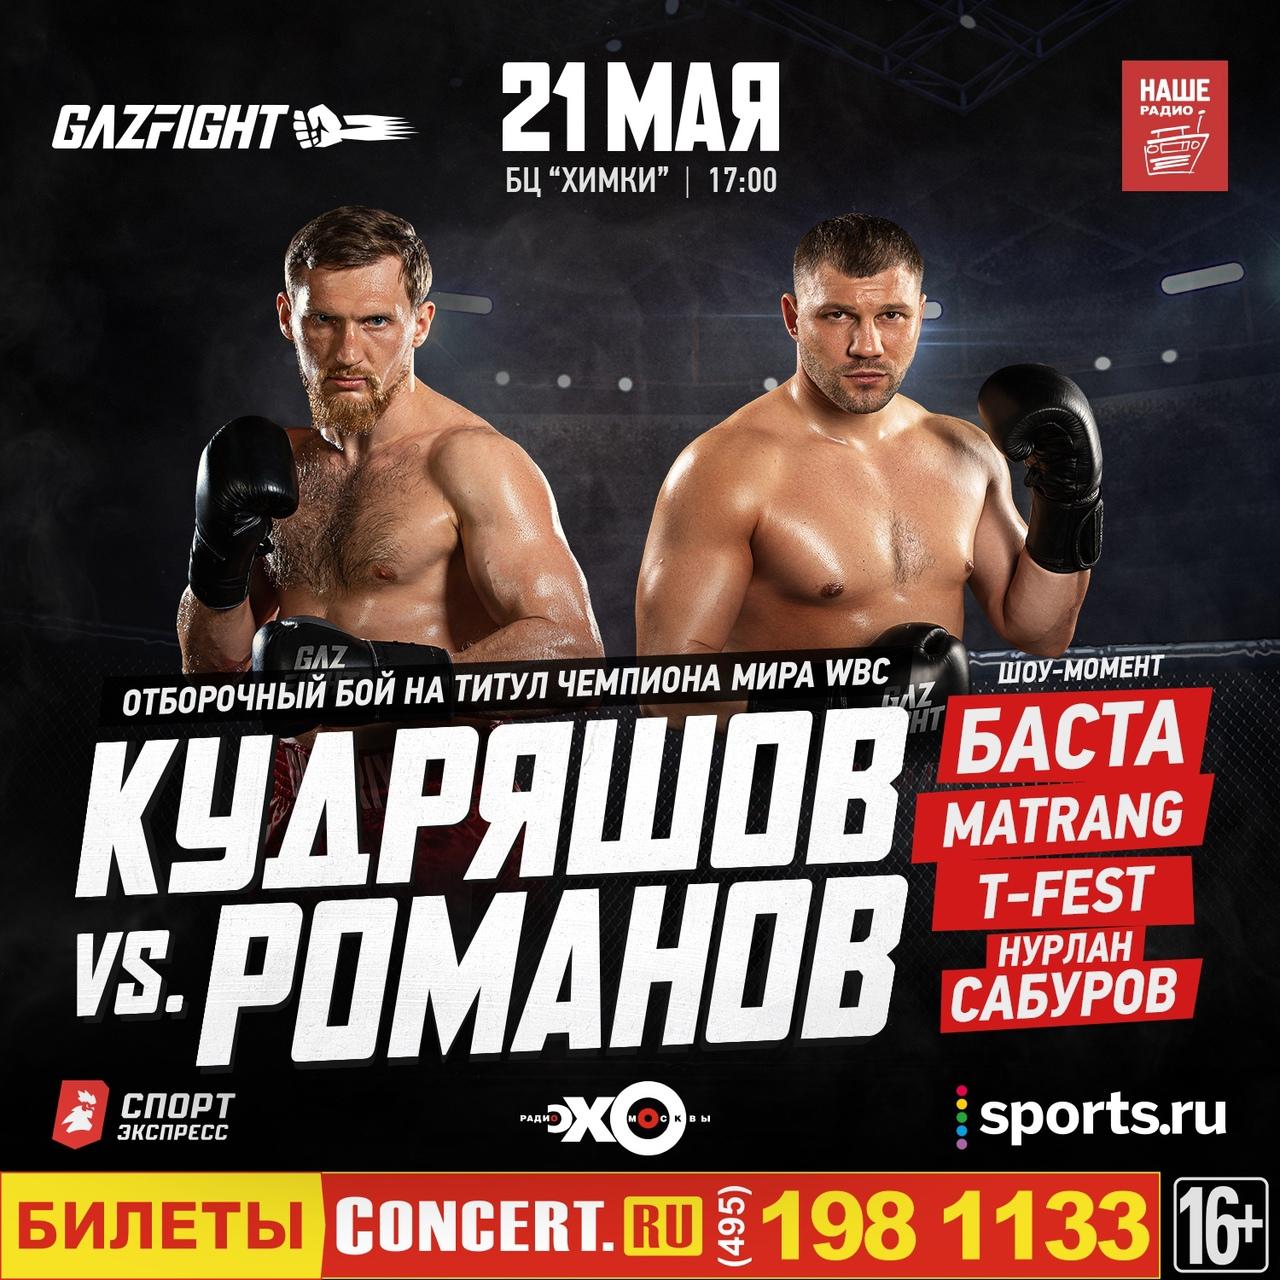 https://suljosblog.com/suljos/wp-content/uploads/2021/05/kudryashov-romanov.jpg